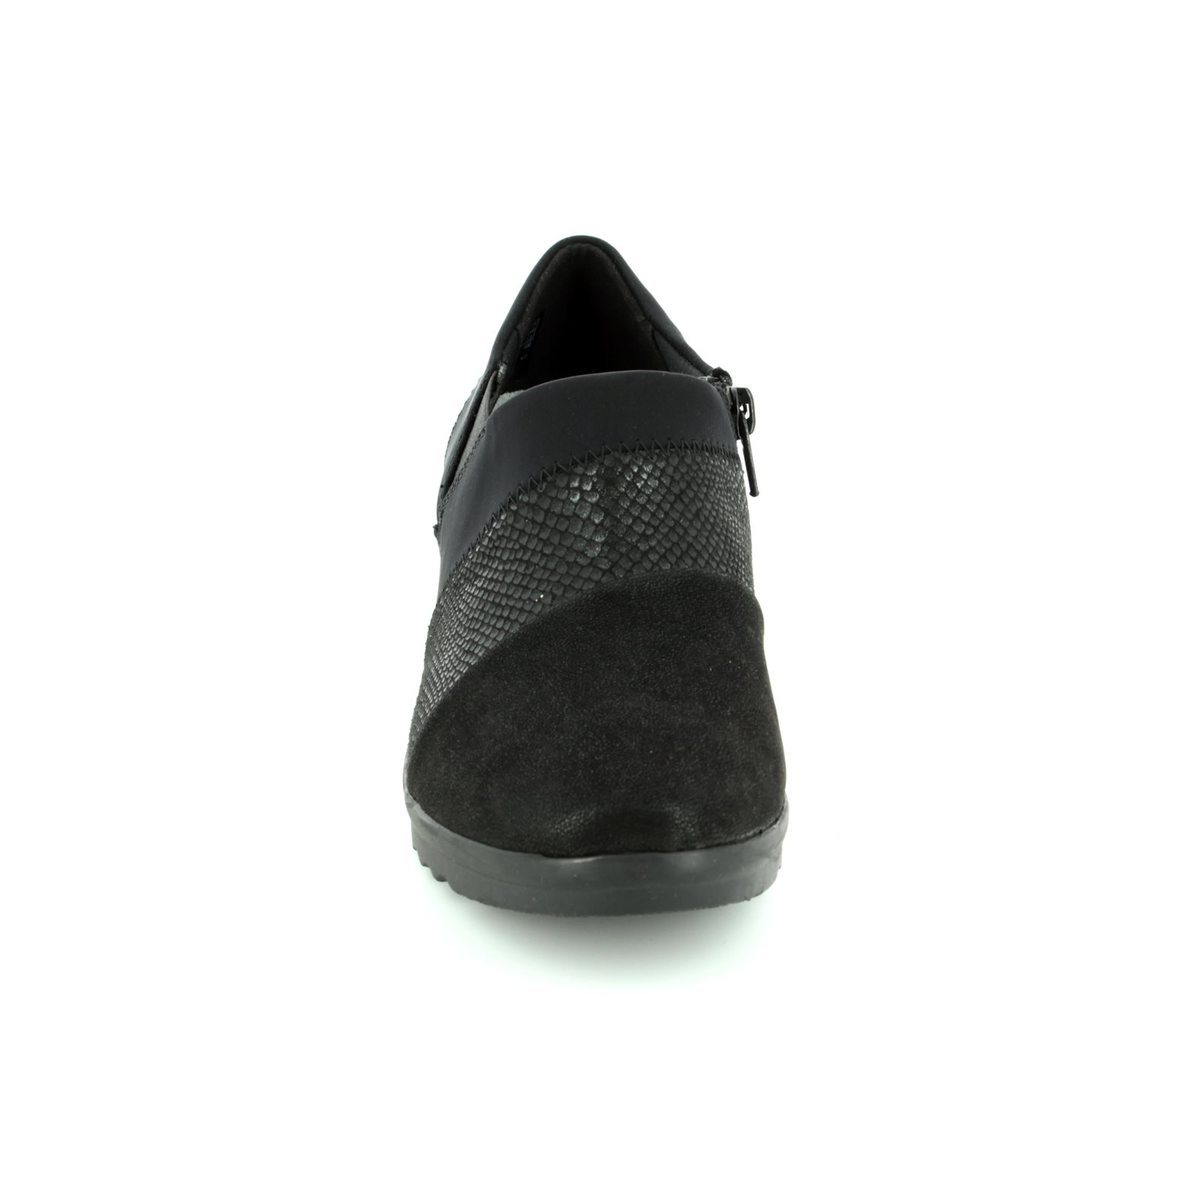 Clarks Caddell Denali D Fit Black Comfort Shoes Island Slip On Loafers Leather Dark Brown 2936 94d